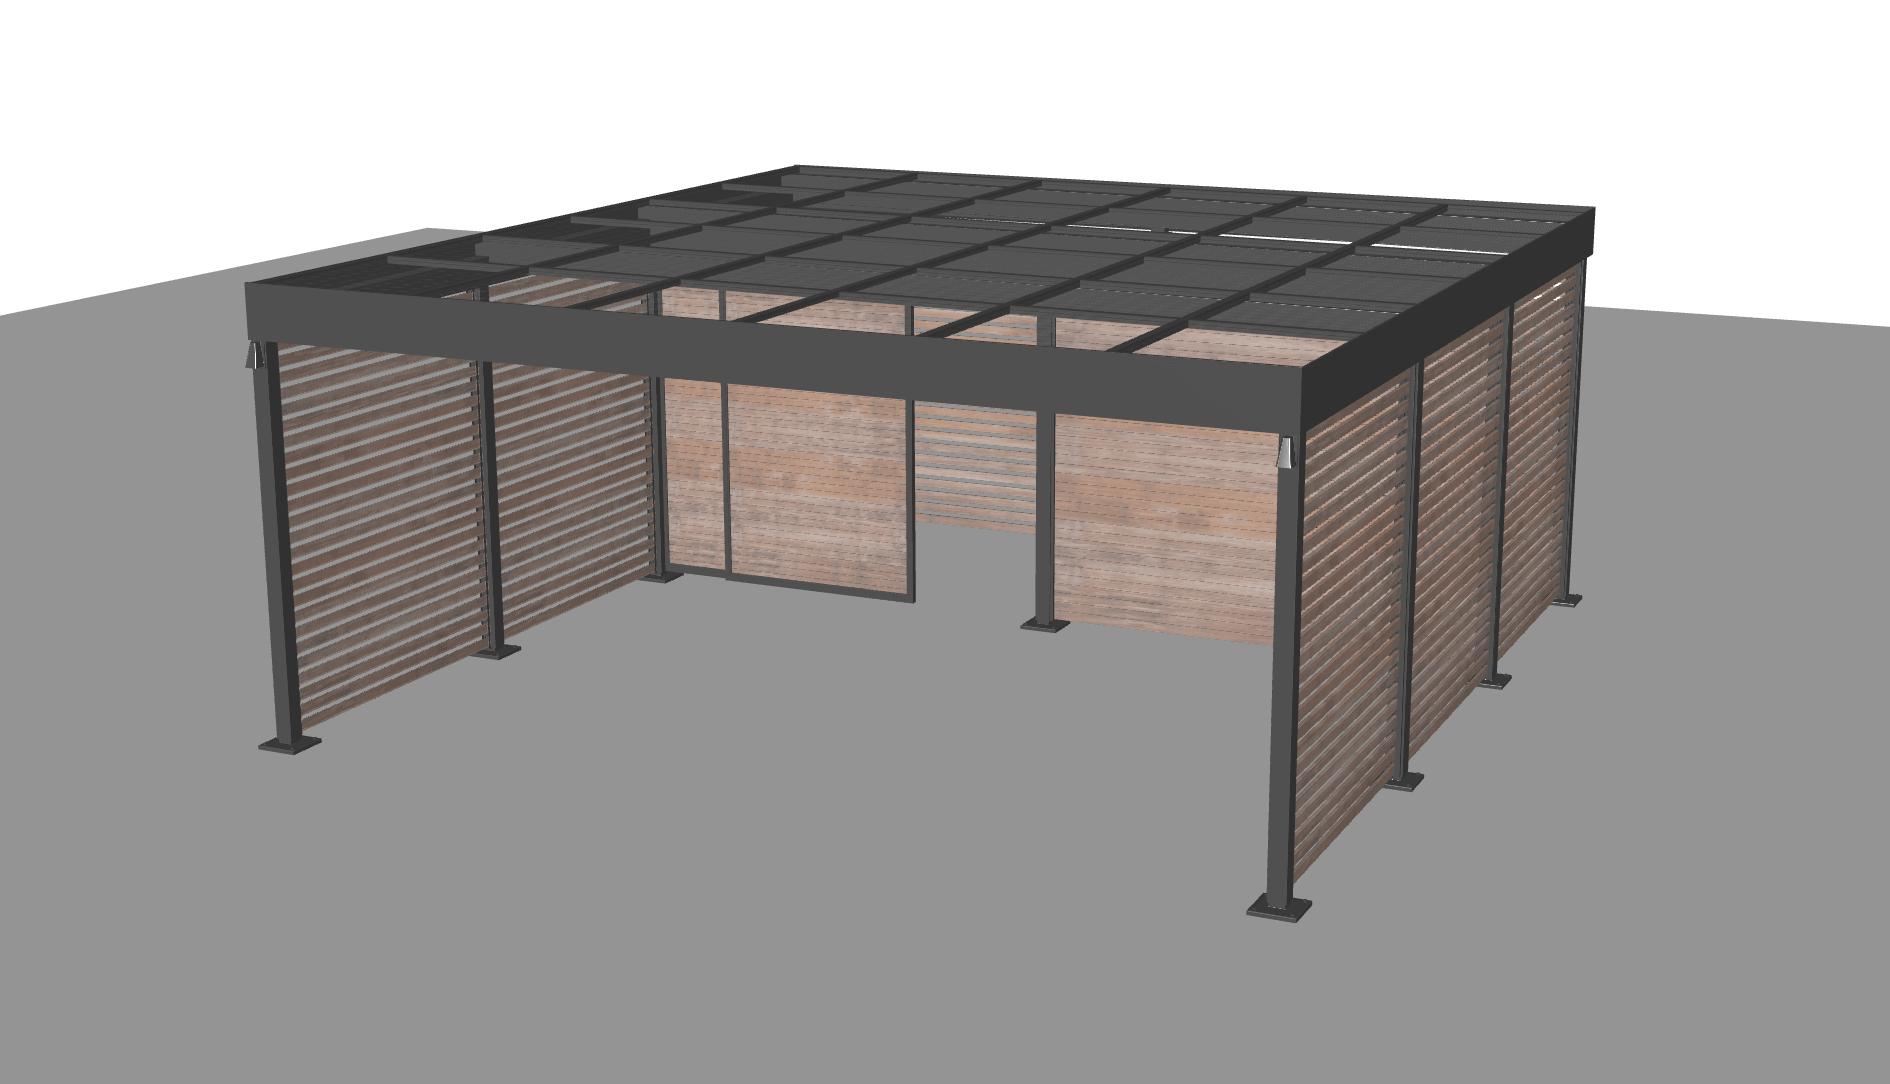 2 Bays - Full Equipment Room